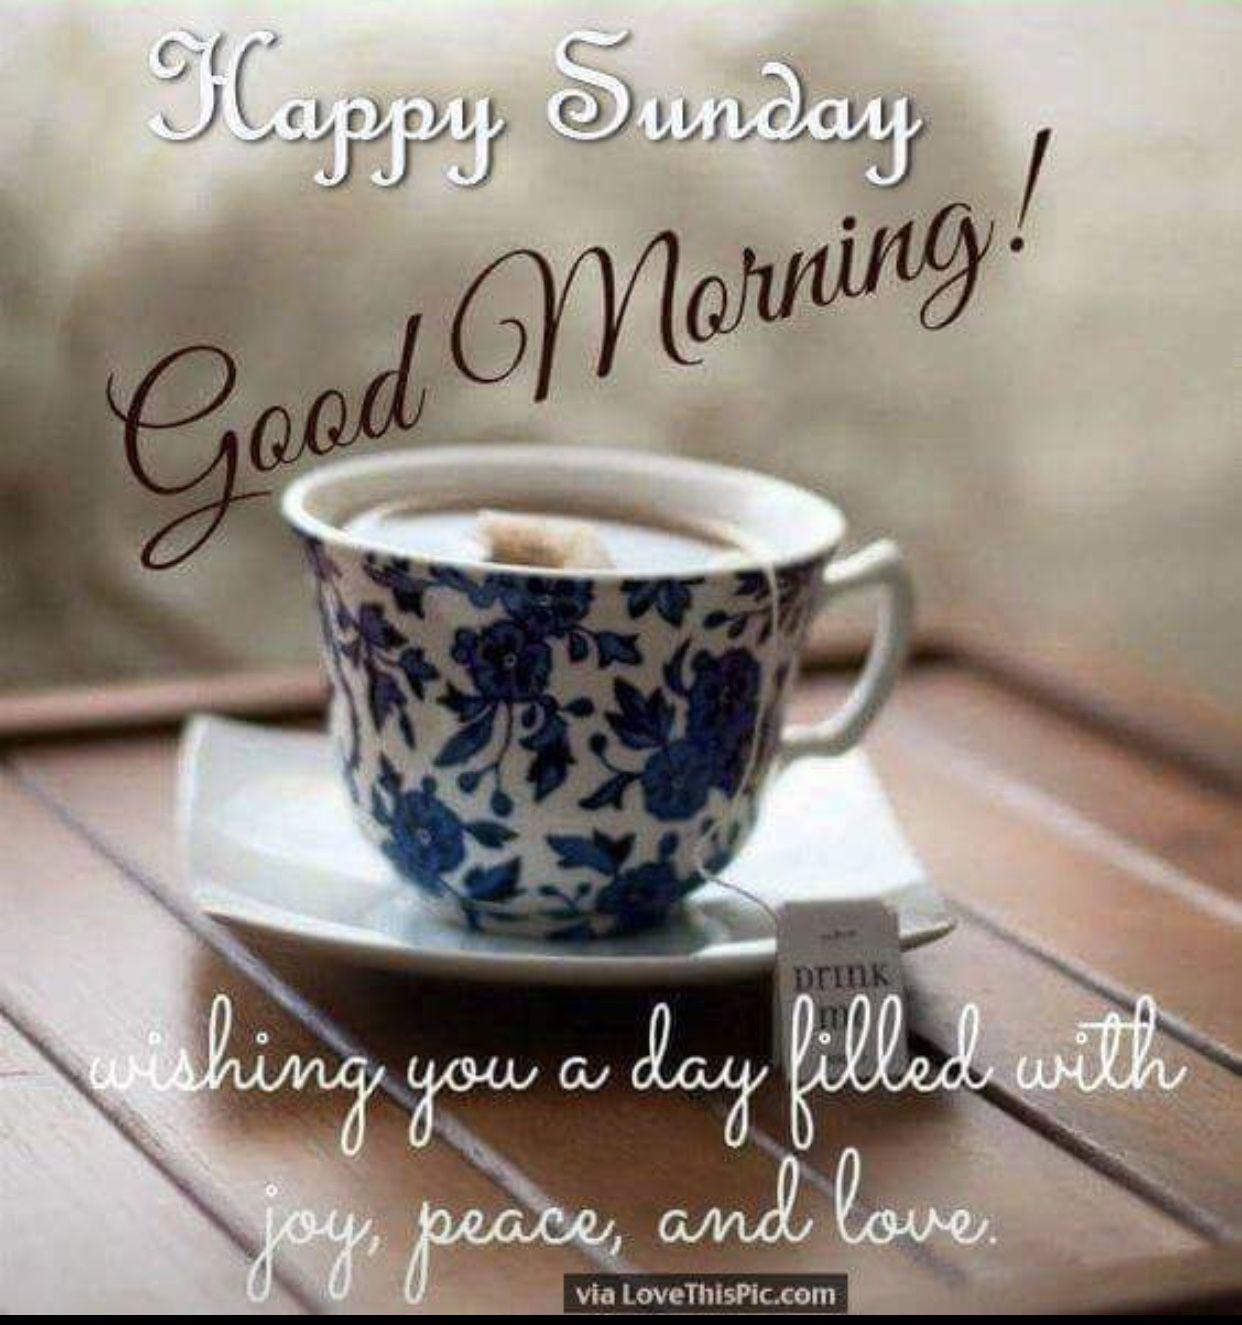 Pin By Simmi On Good Morning Good Morning Happy Sunday Good